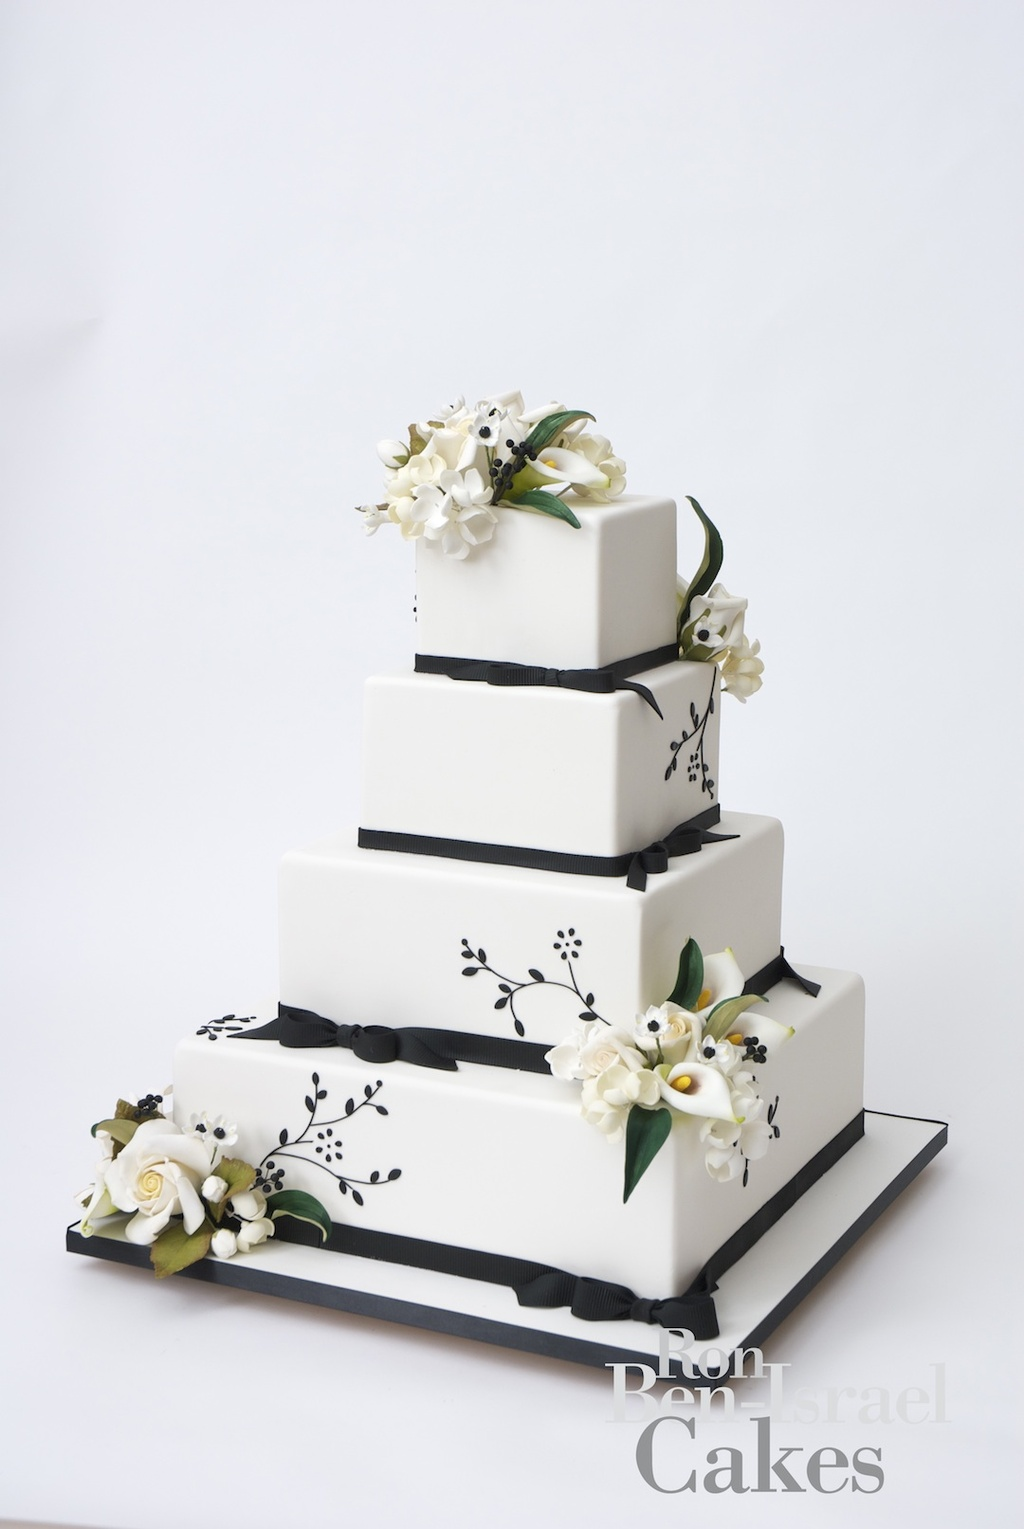 Wedding-cake-inspiration-ron-ben-isreal-wedding-cakes-white-black-bows-lillies.original.full